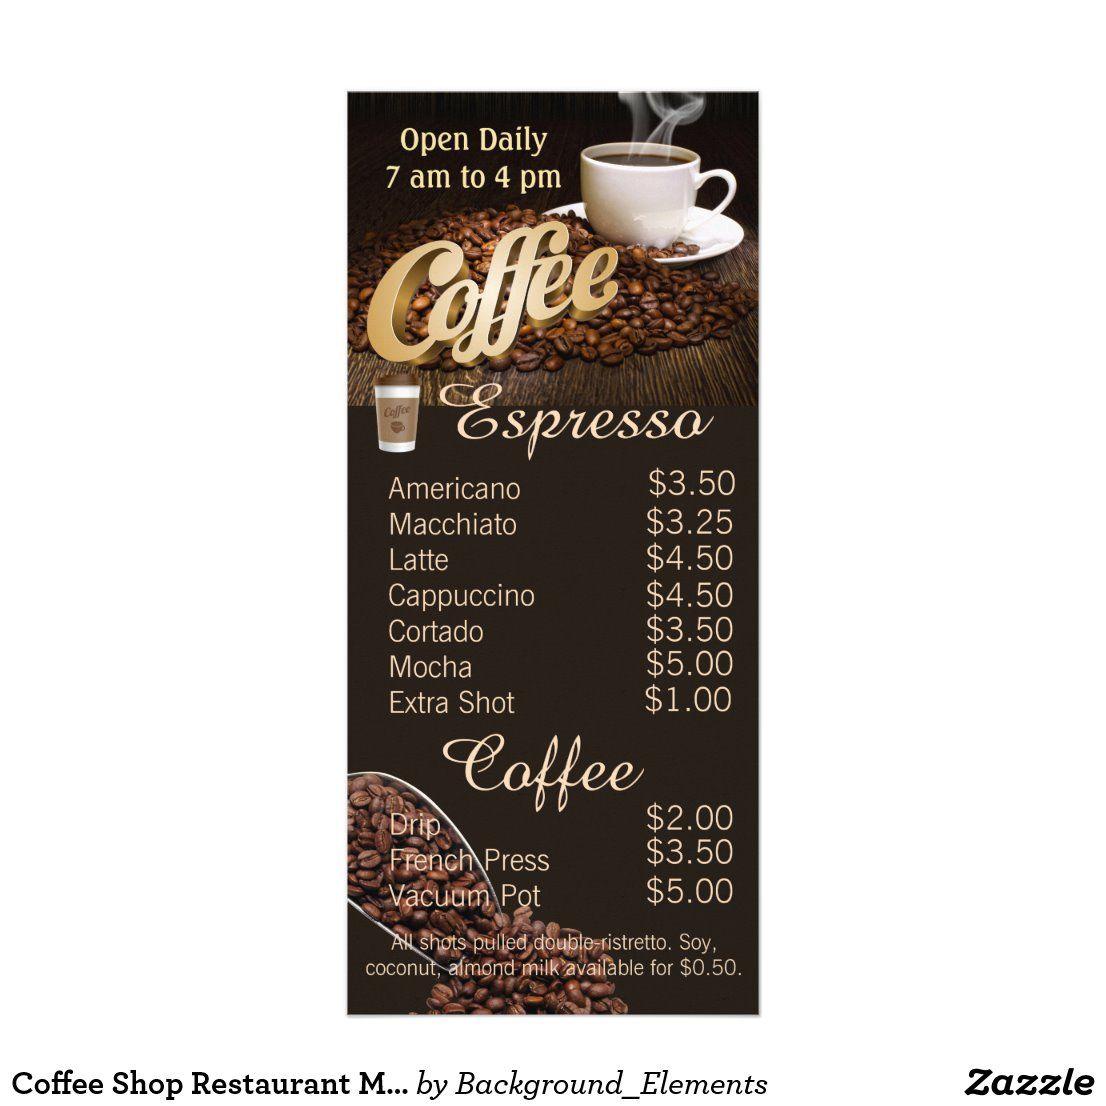 Coffee Shop Restaurant Menu And Price List Zazzle Com In 2020 Coffee Menu Coffee Shop Menu Coffee Shop Menu Board